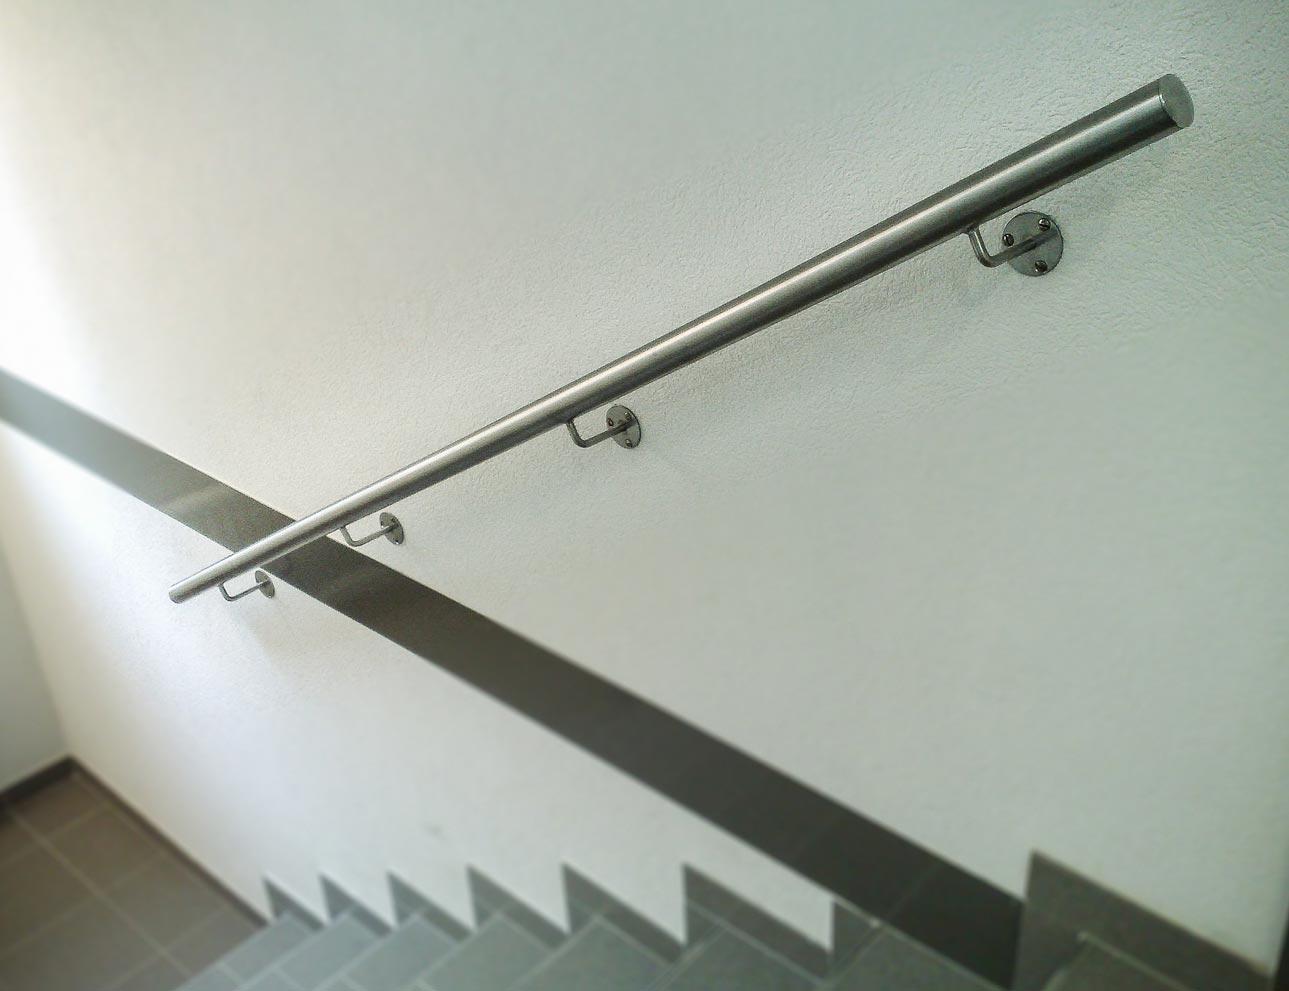 Main Courante Escalier Corde choisir et installer une main courante: le guide complet